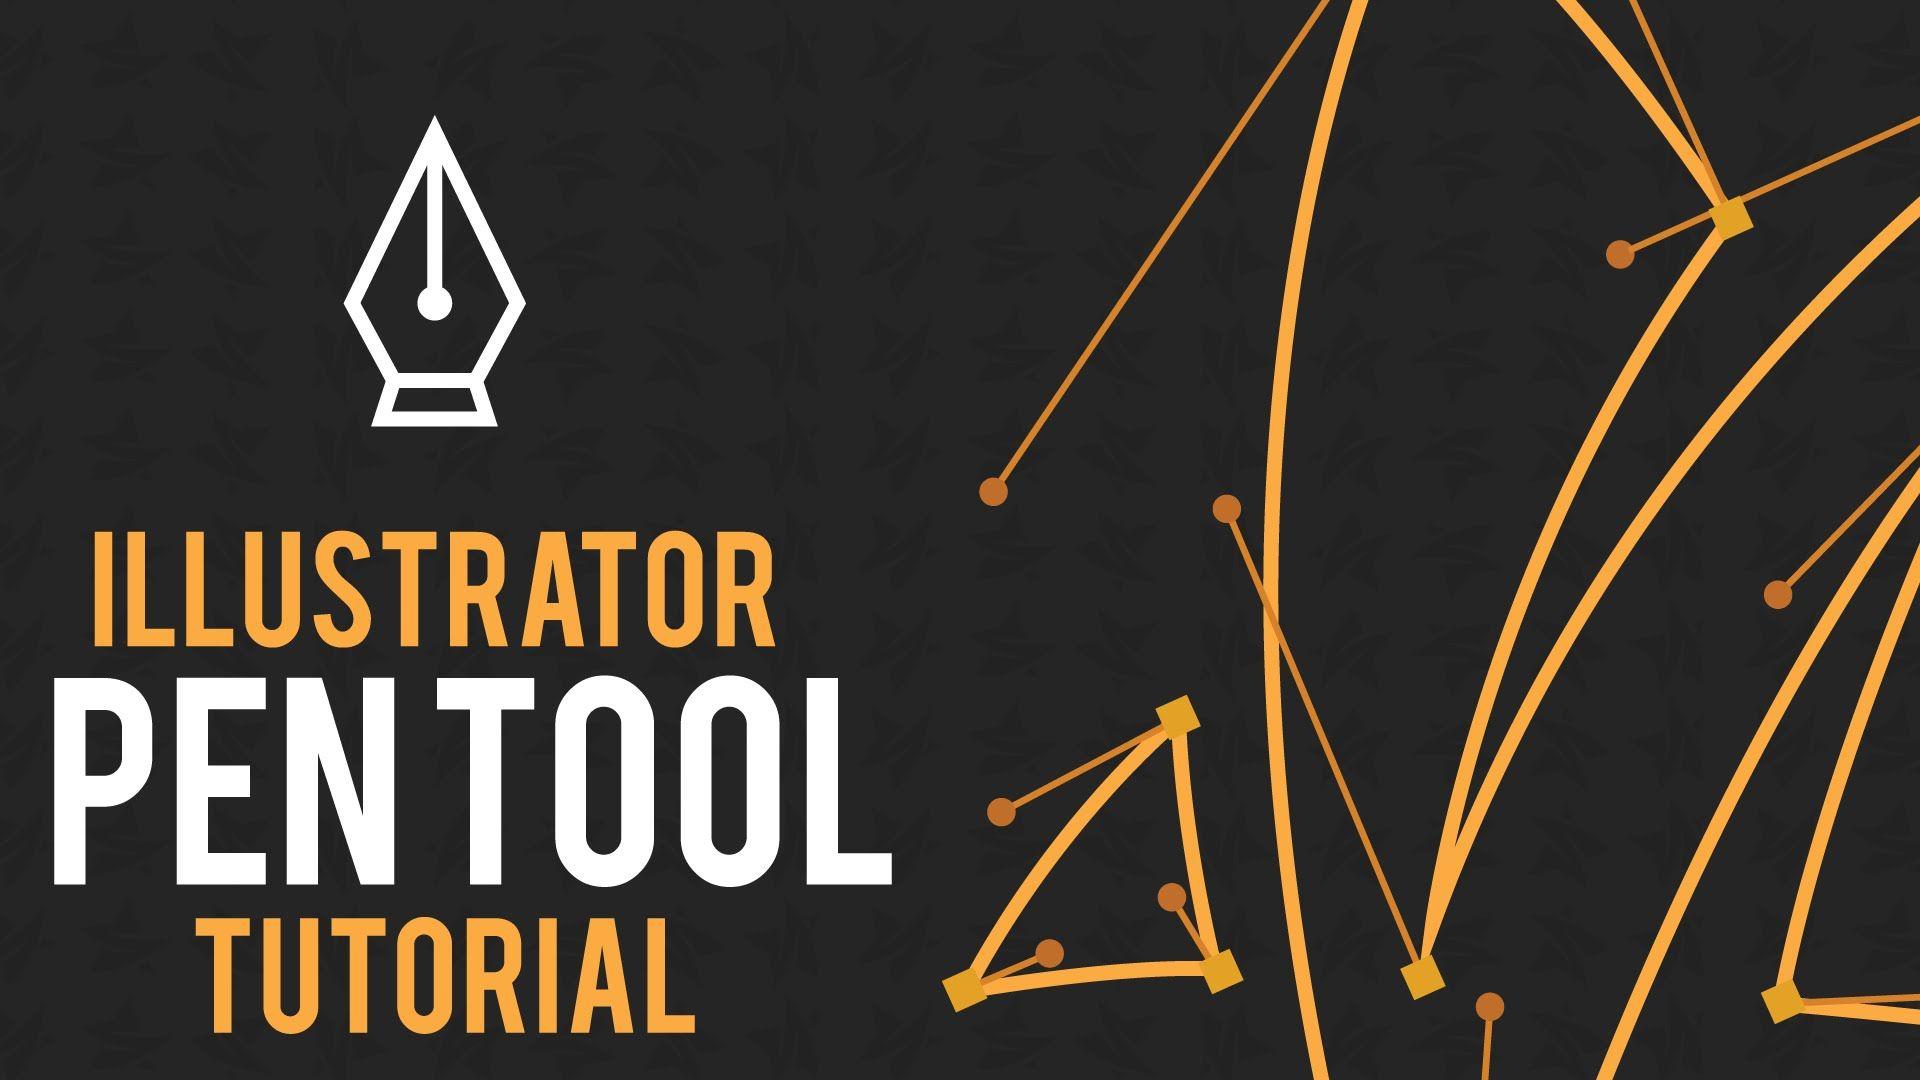 Join maker studios partnering program httpawedjxo3 star join maker studios partnering program httpawedjxo3 star adobe illustrator tutorialsphotoshop baditri Image collections